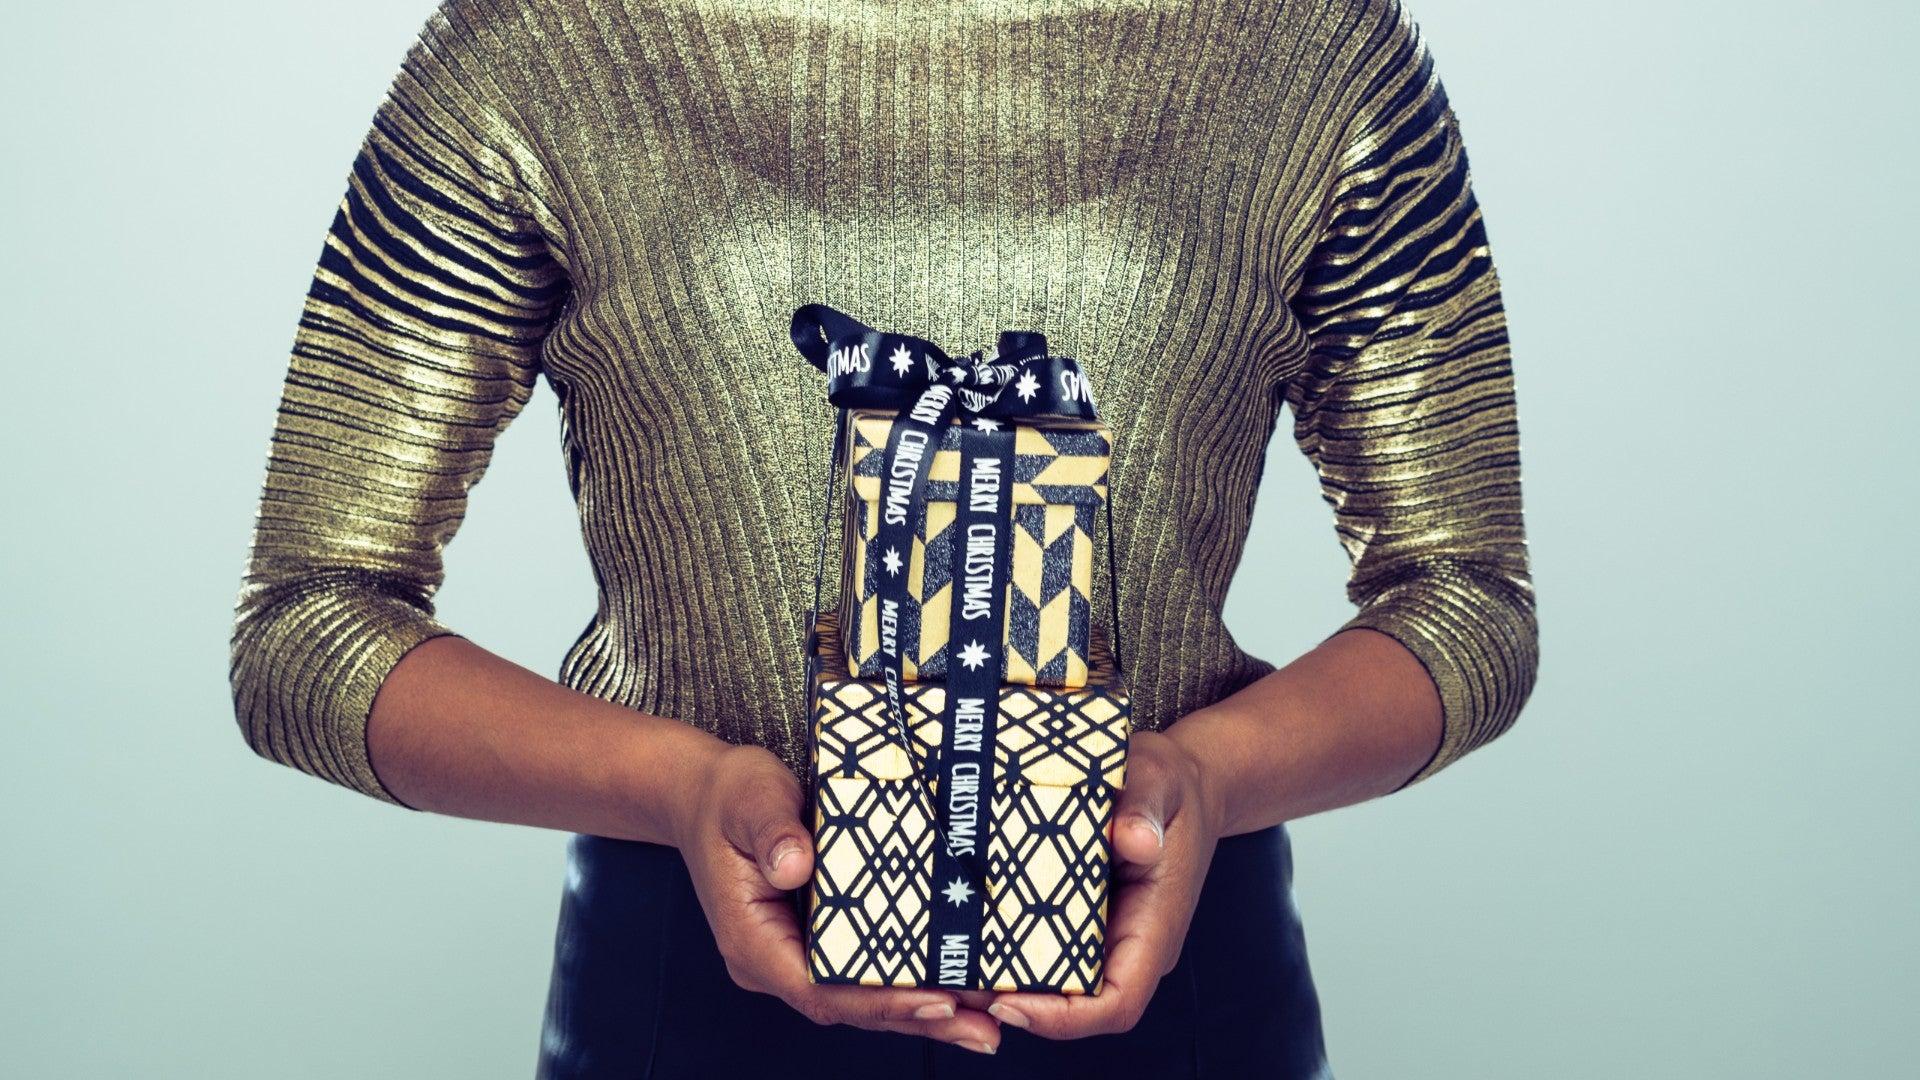 5 Beauty Gifts Your Fancy Friends Will Love